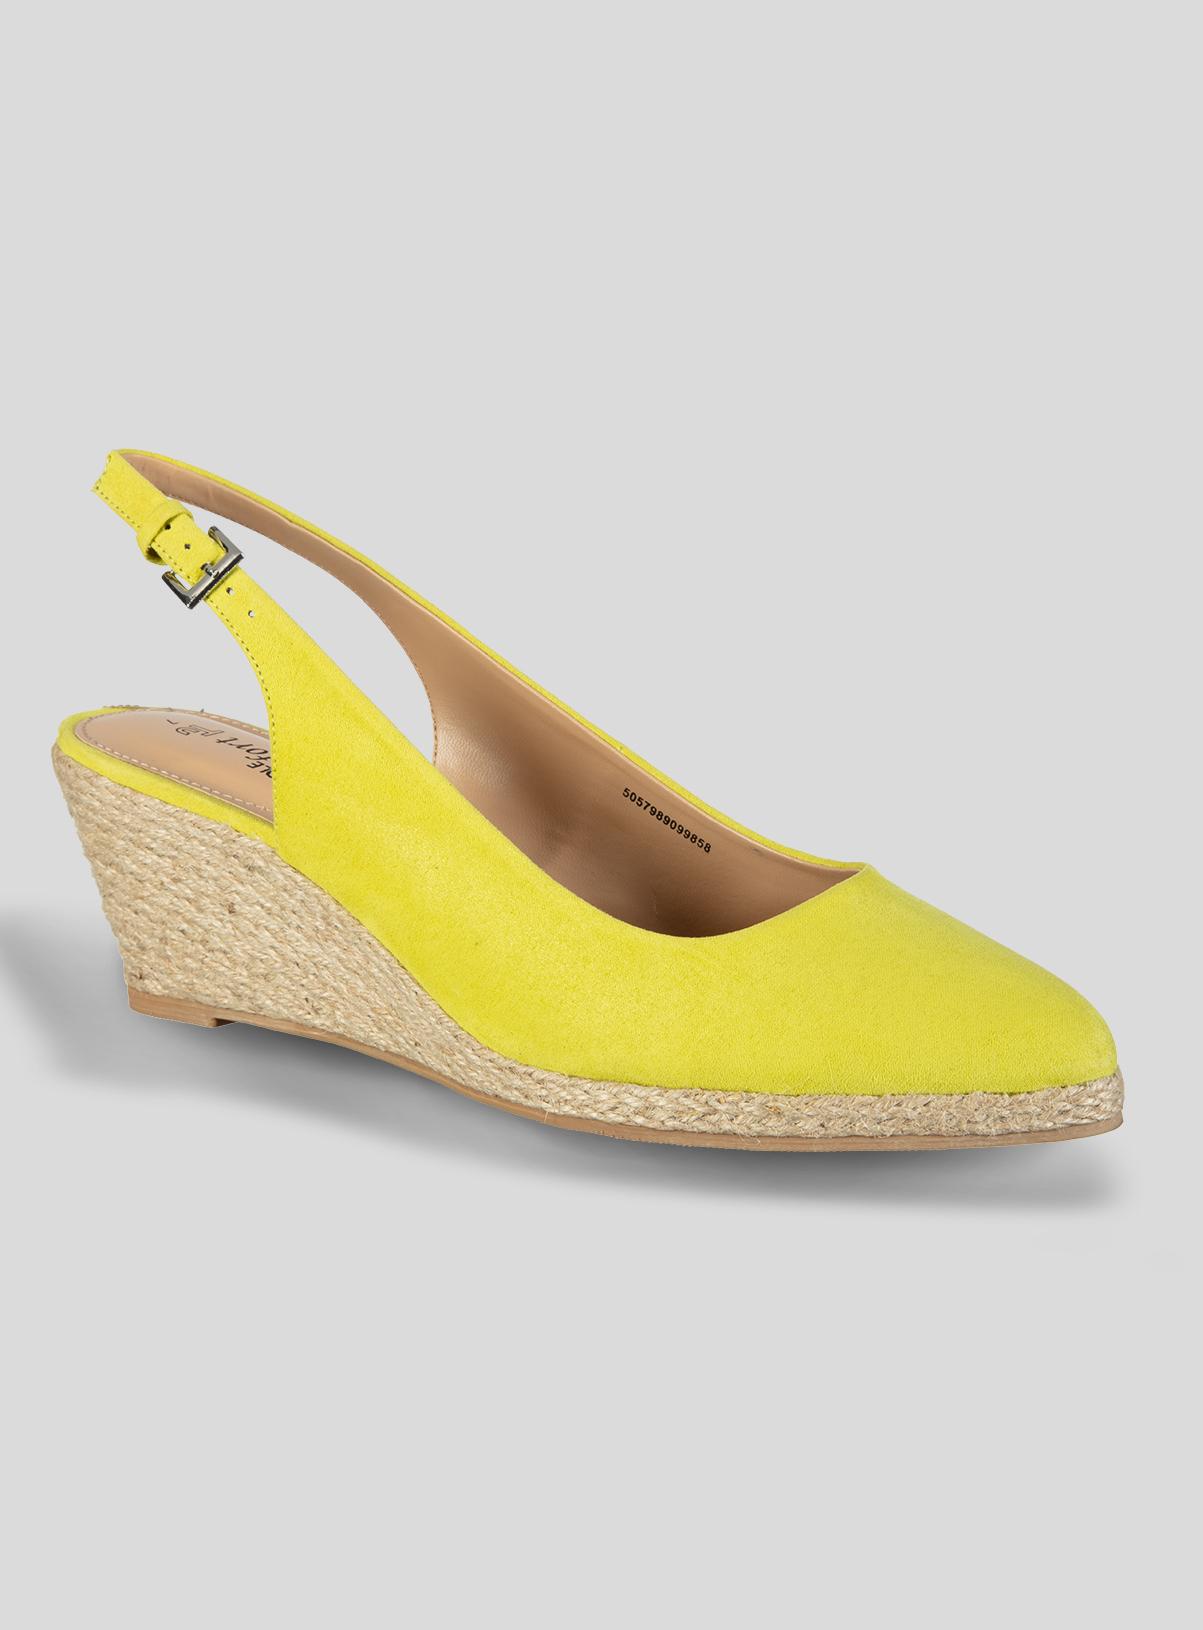 Women's Lime Green Raffia Sling Back Wedge Shoes